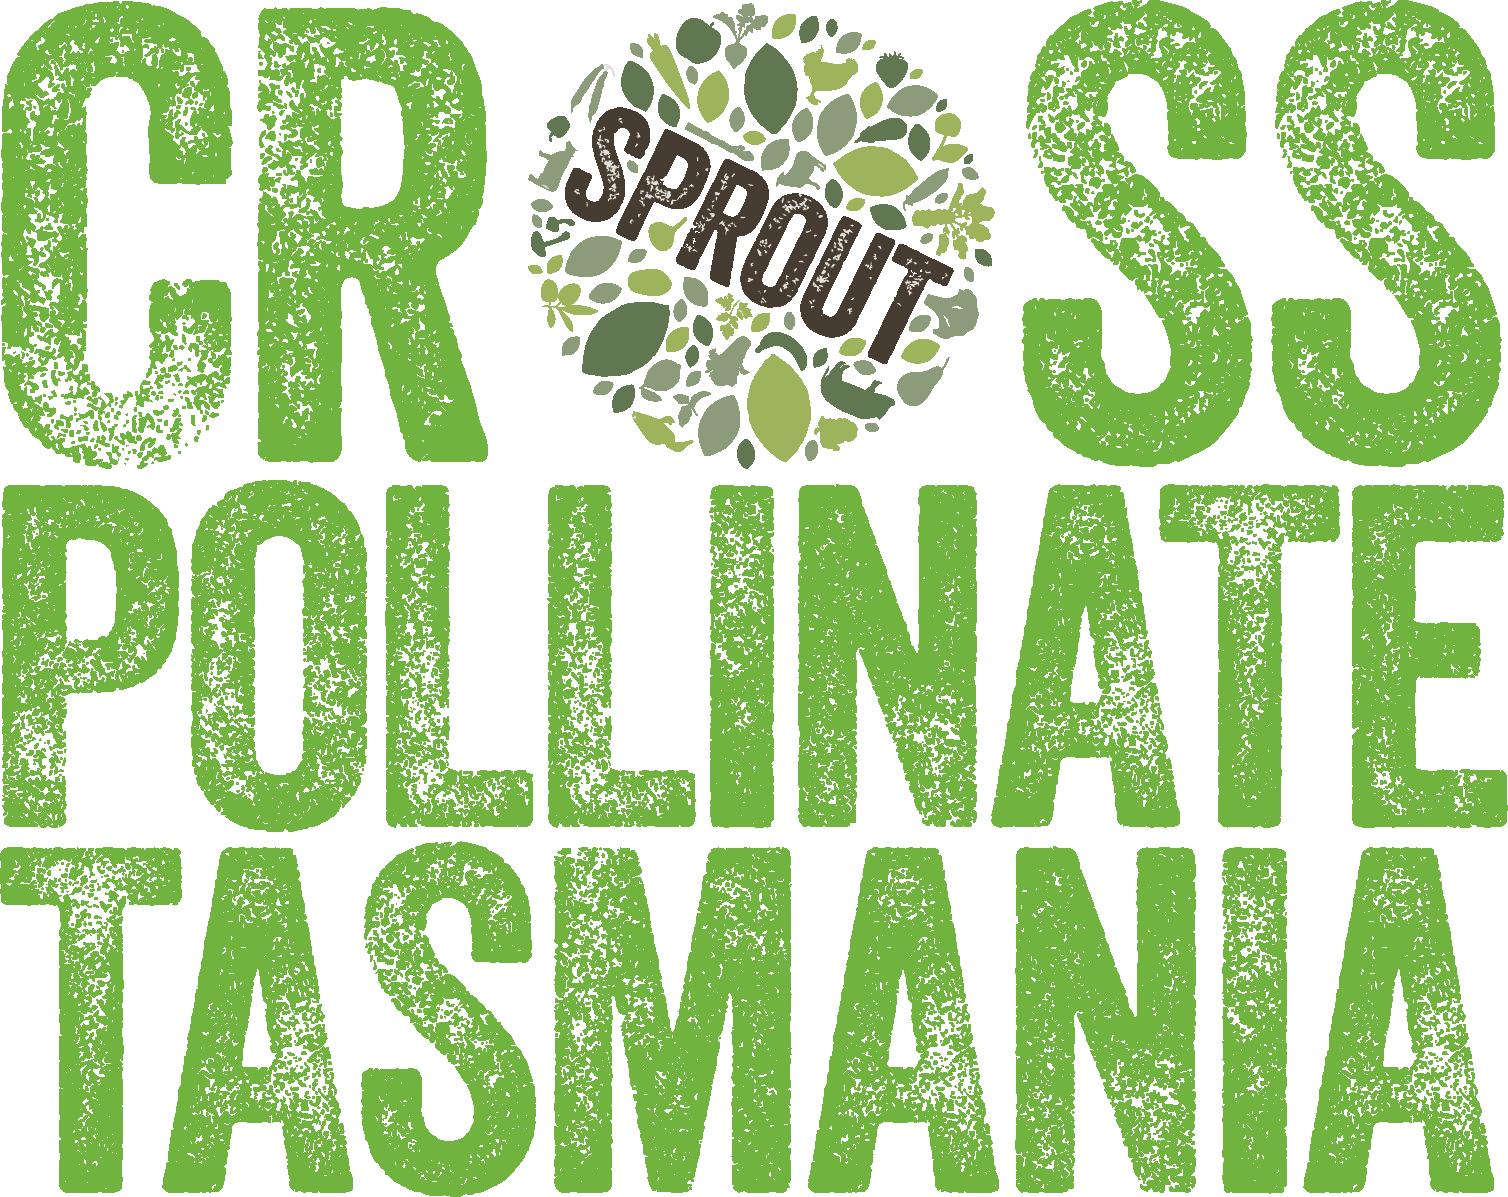 Cross Pollinate